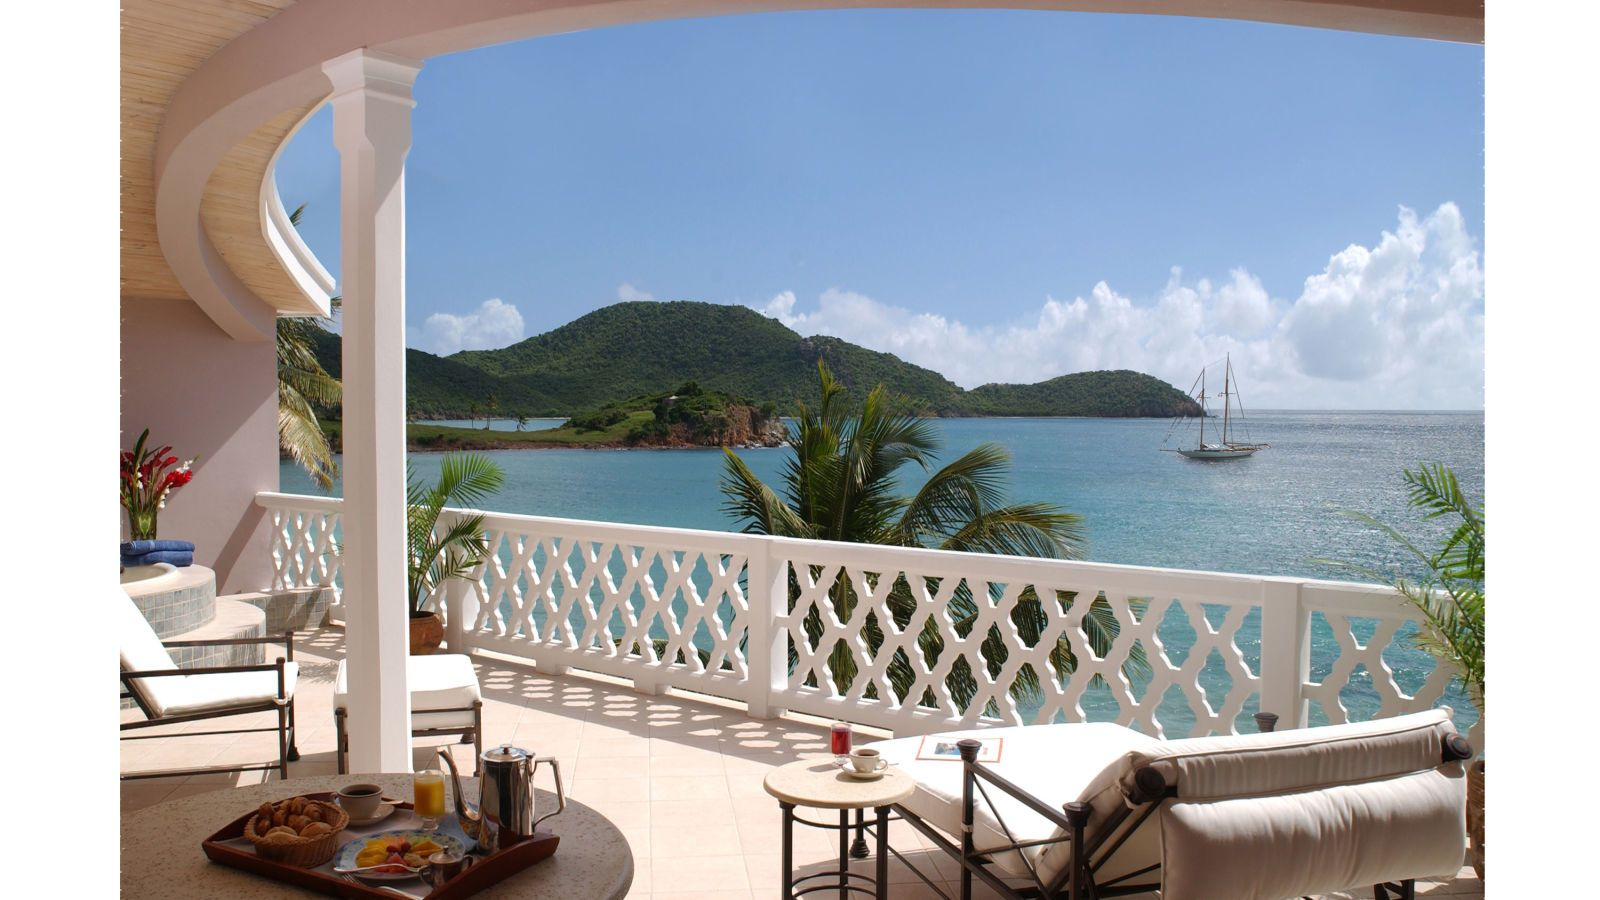 The World S Best Balconies Best Resorts Best Hotels Top 10 Hotels